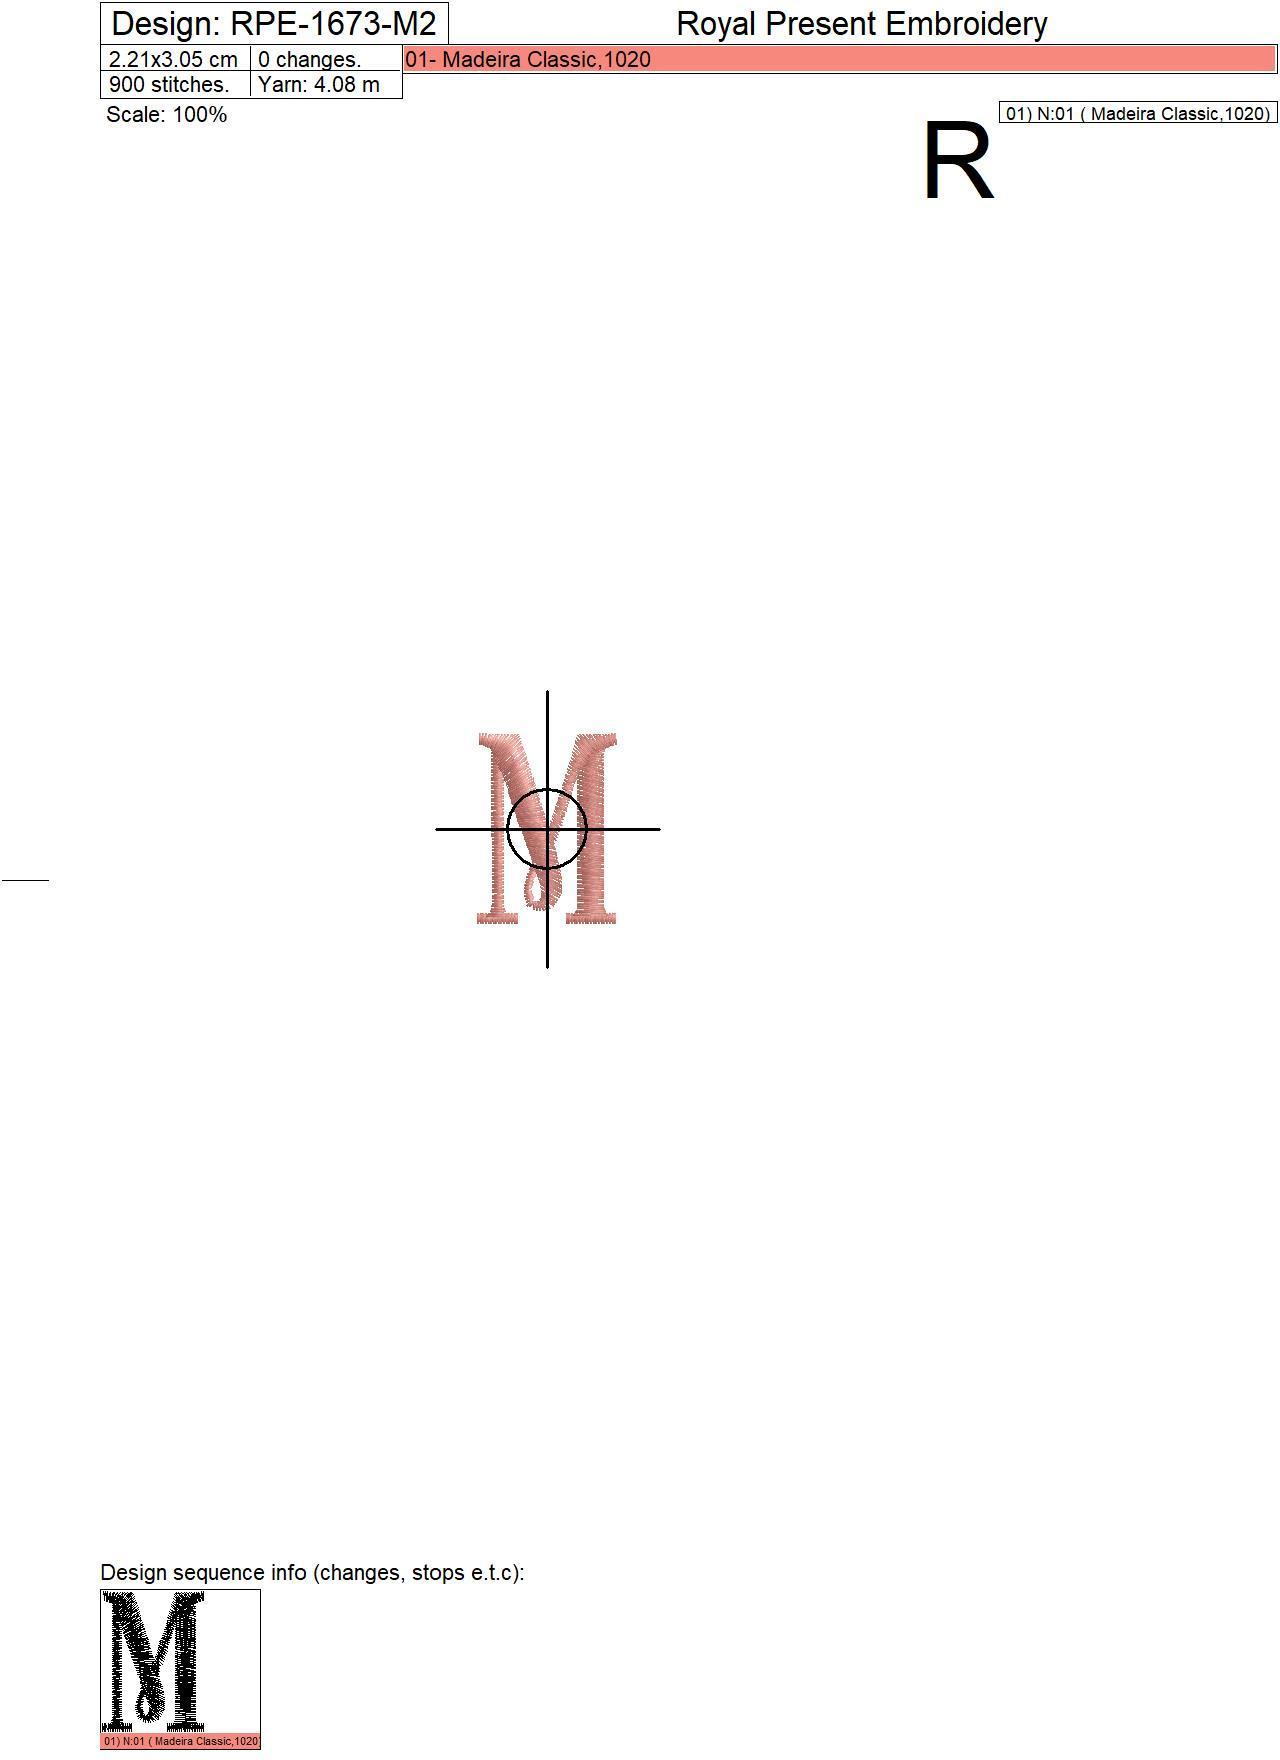 Capital Letter M Embroidery design V2